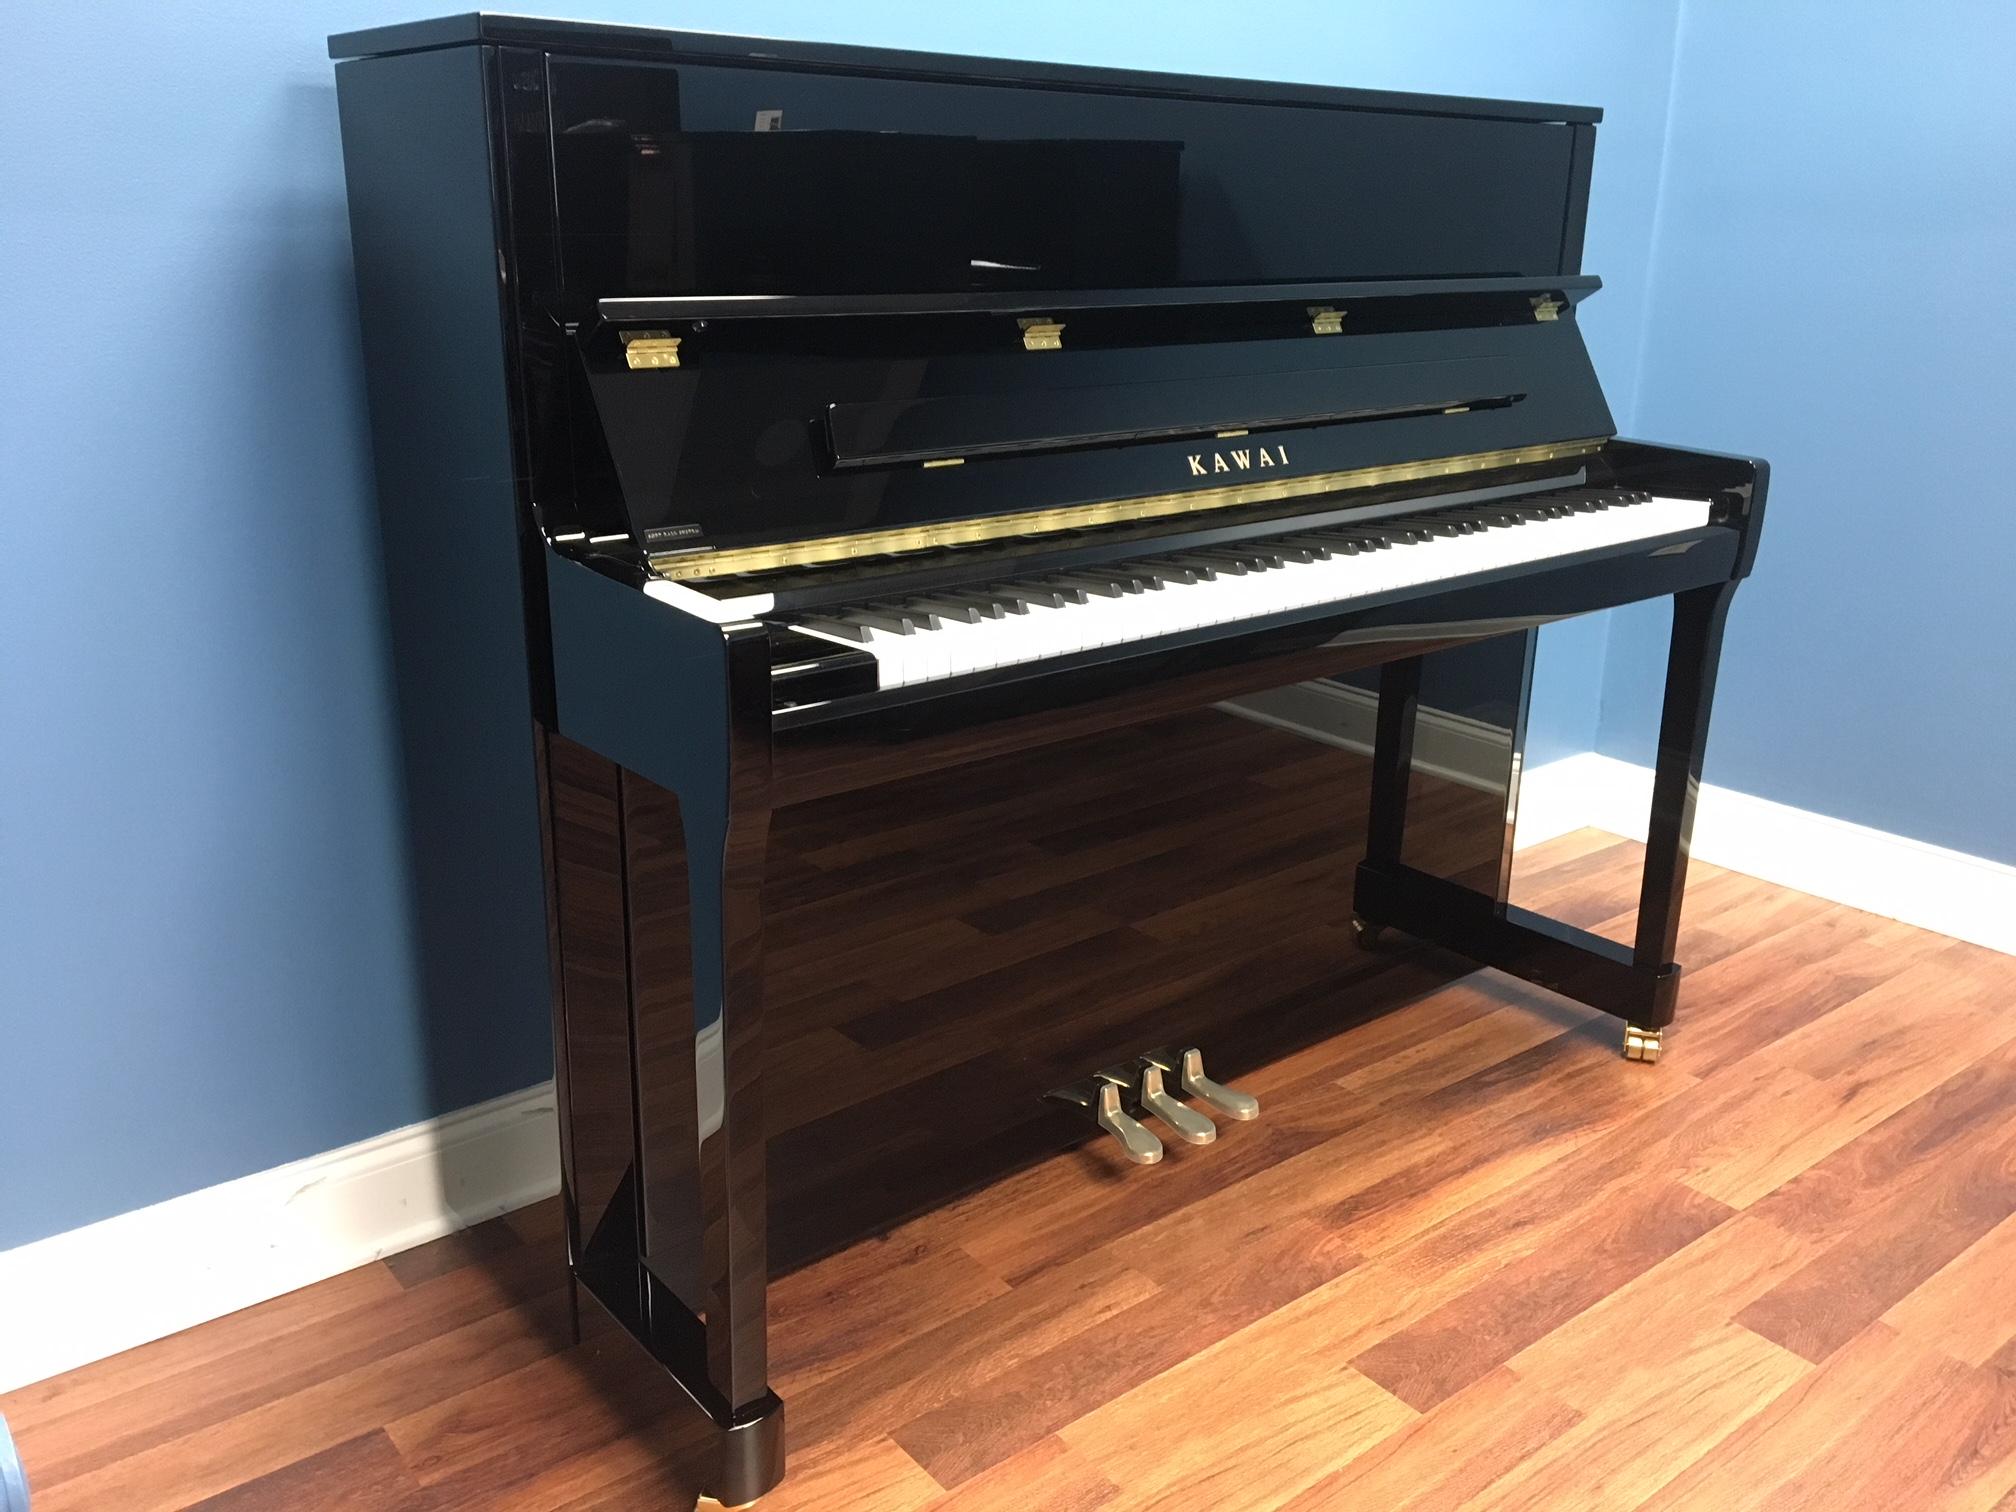 Kawai K 300 Studio Upright Freeburg Pianos